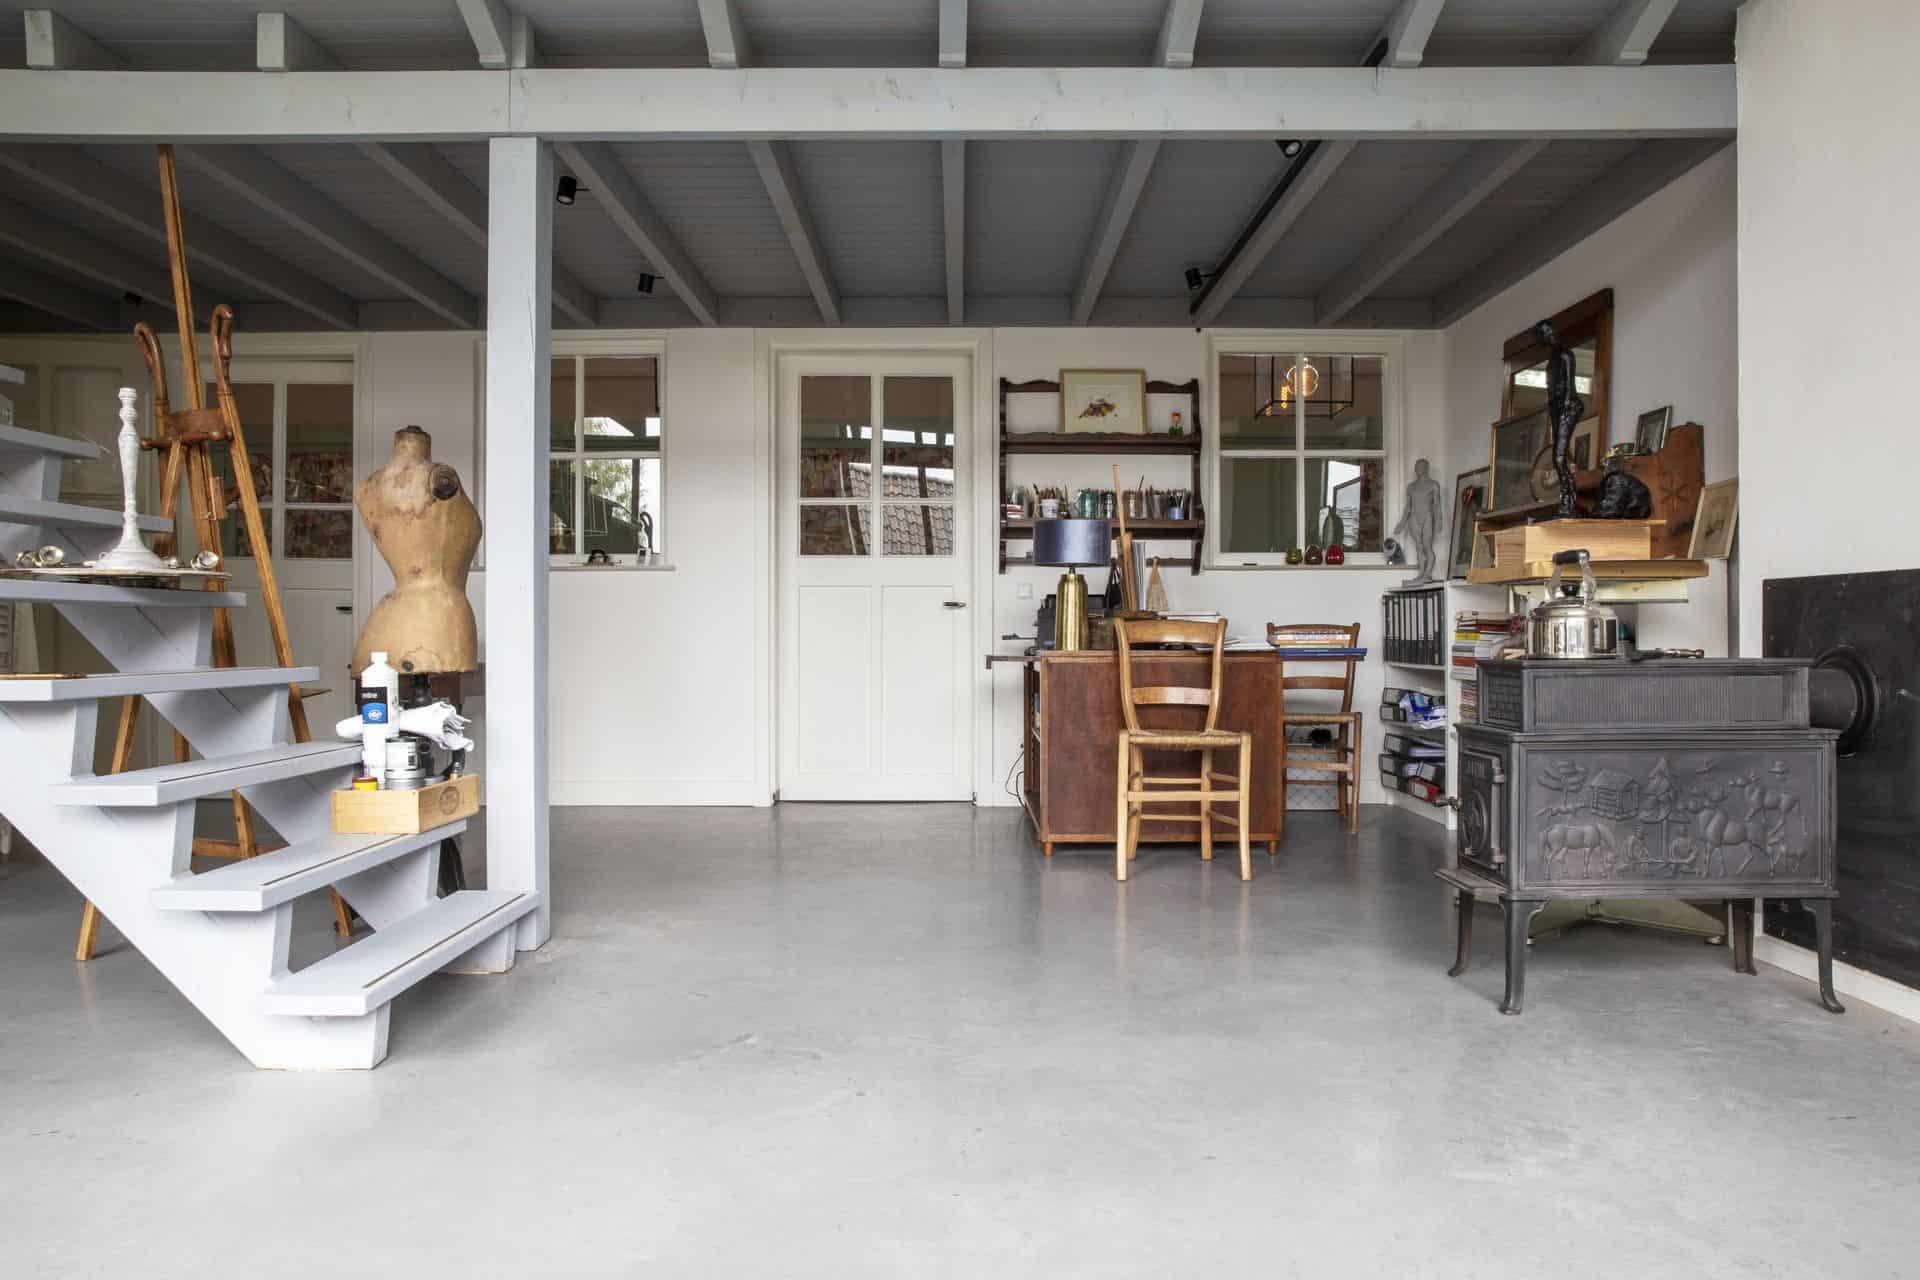 hoelang stucloper, gevlinderd woonbeton, betonvloer gevlinderd